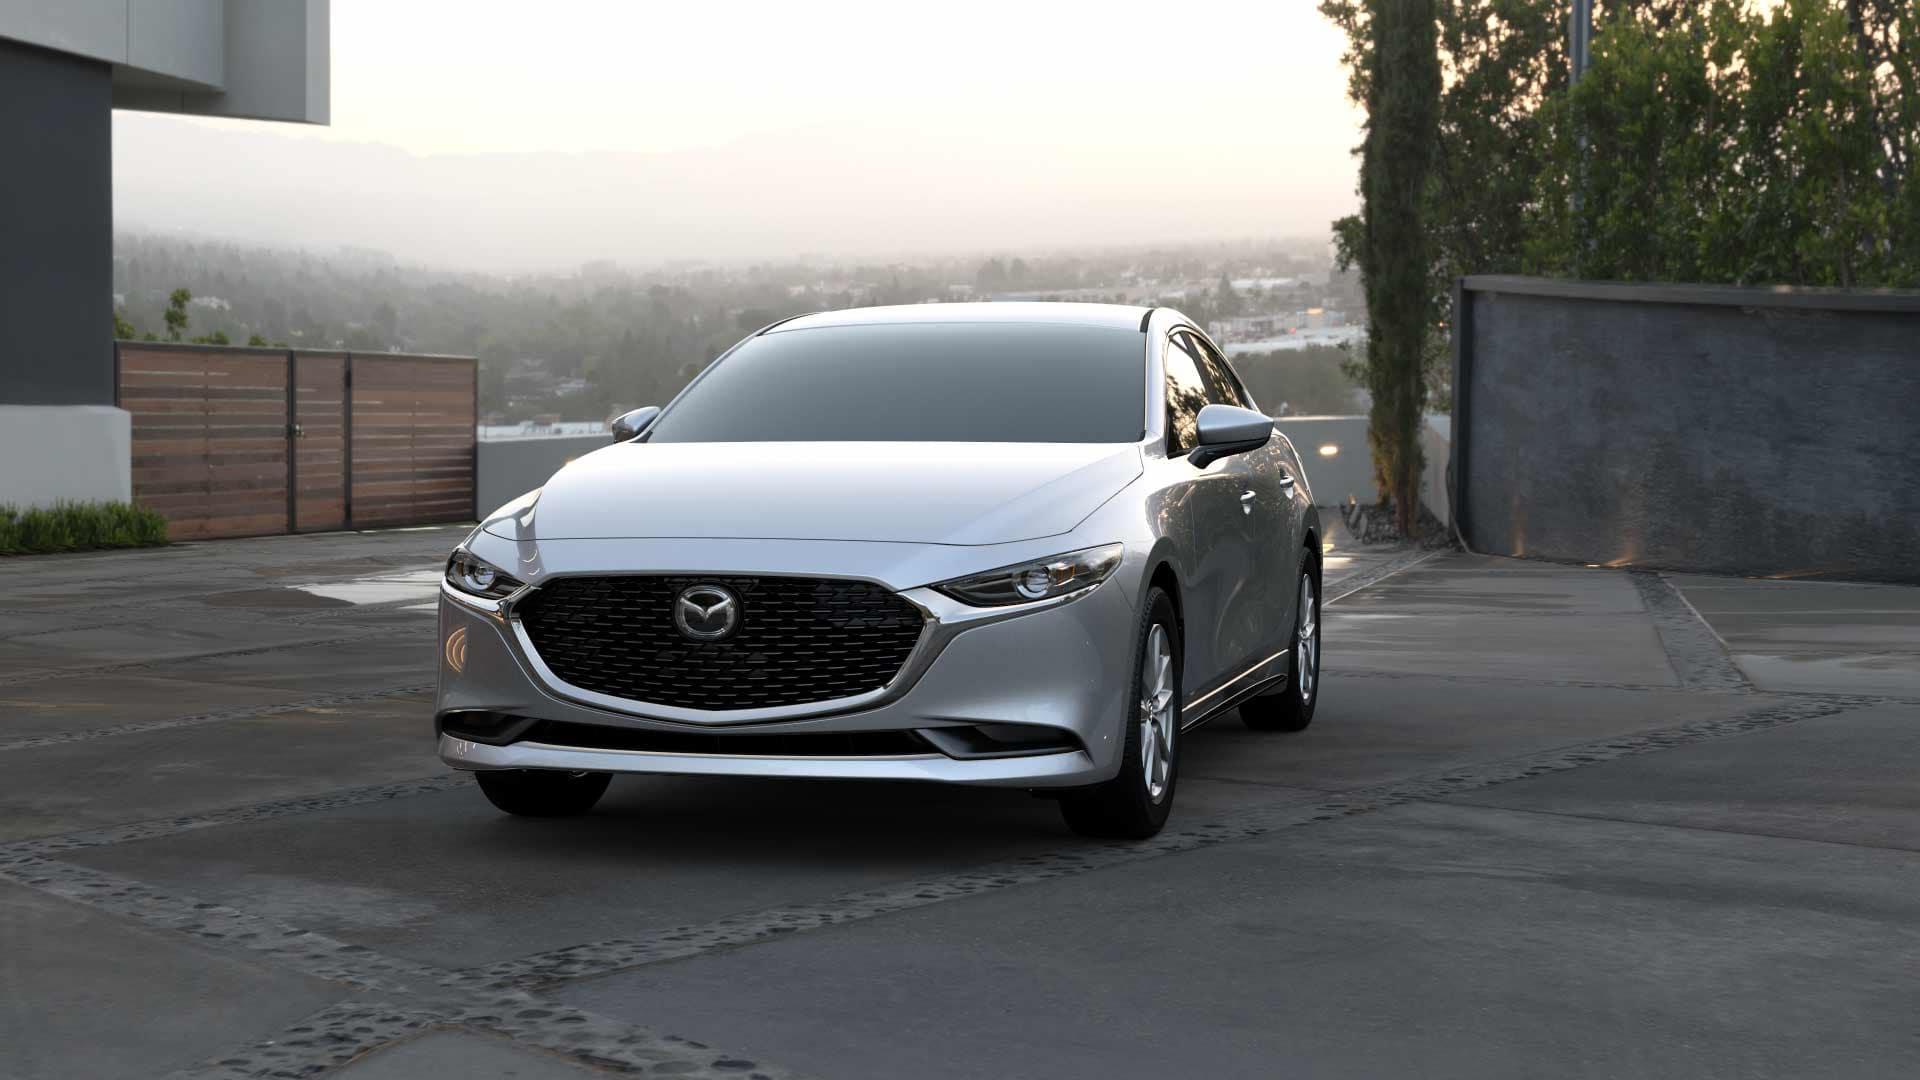 2021 mazda3 sedan exterior silver